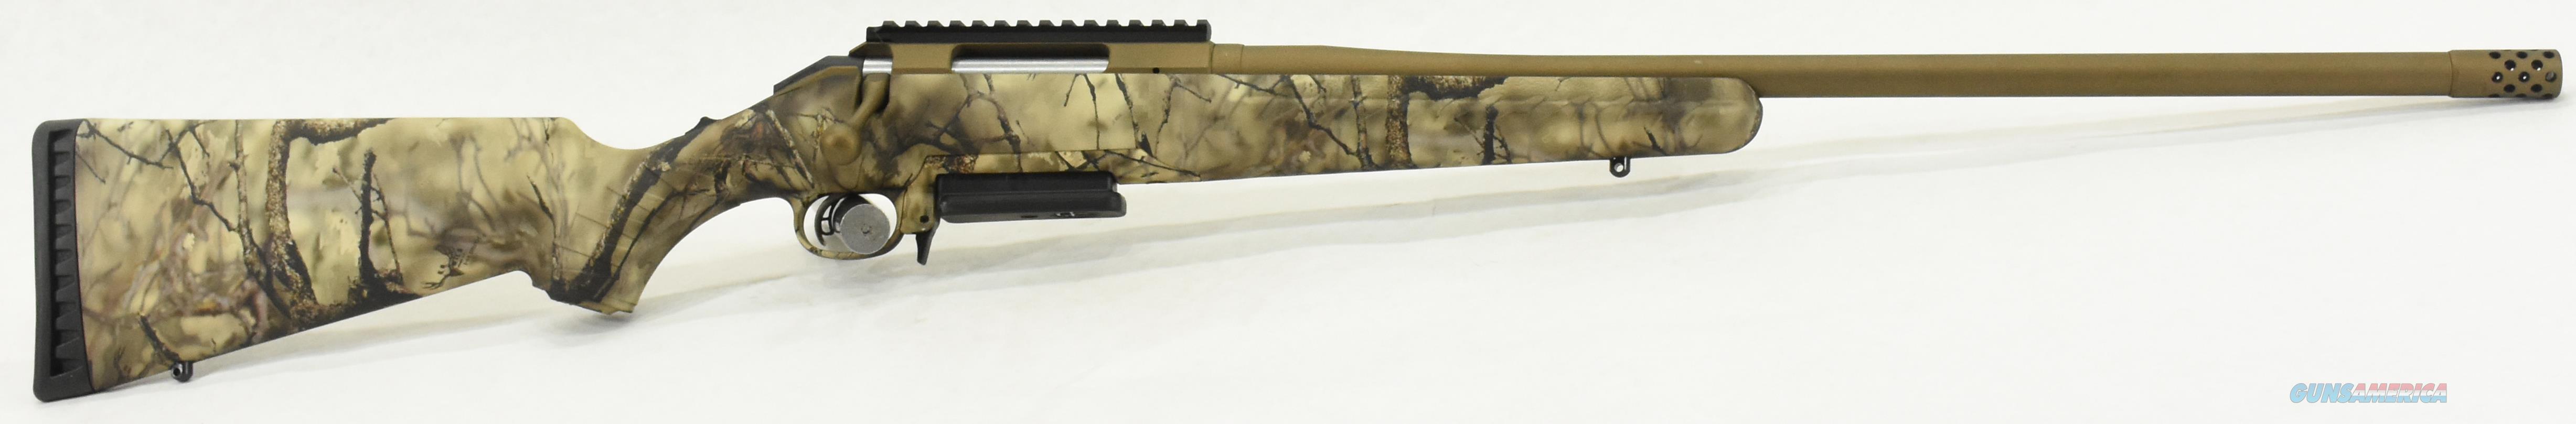 American Go Wild Camo 6.5CM 22In  26925  Guns > Rifles > Ruger Rifles > American Rifle